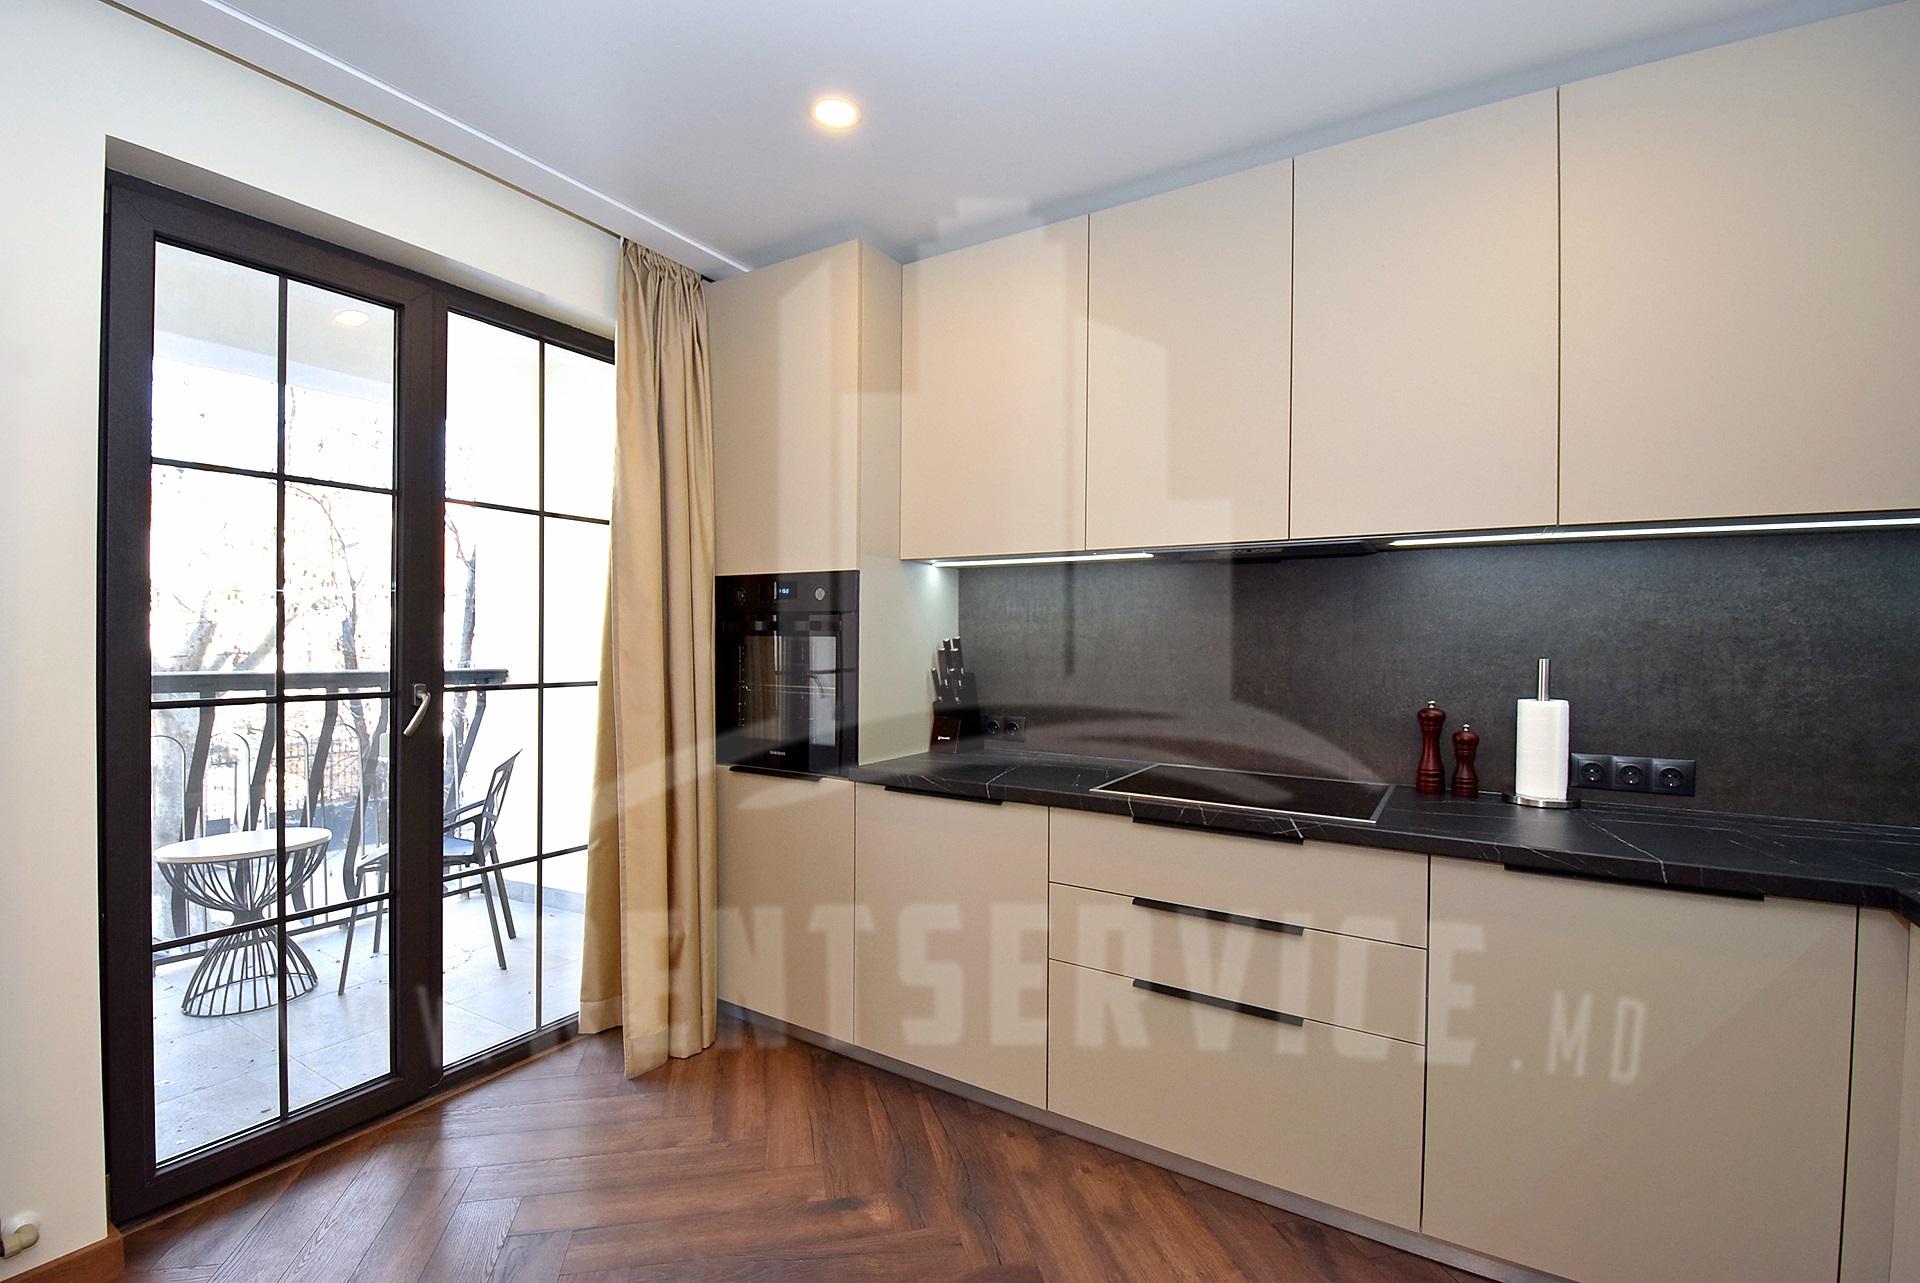 289_apartment_12.JPG